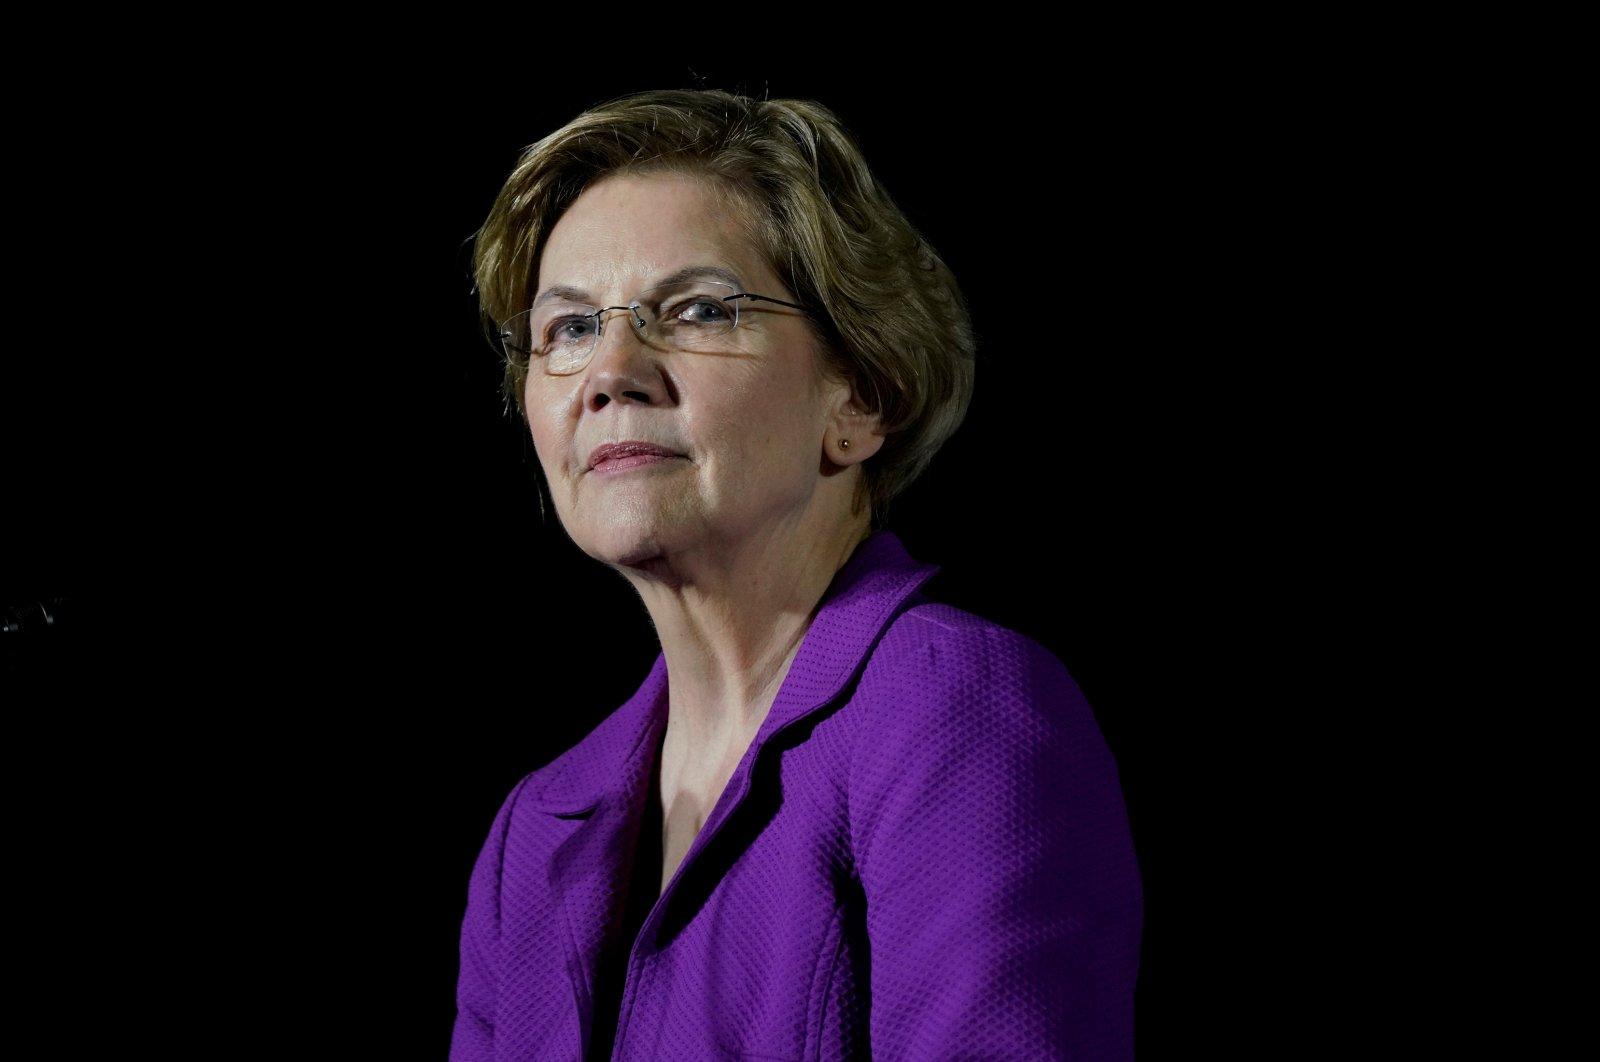 Then-Democratic 2020 U.S. presidential candidate Senator Elizabeth Warren speaks to supporters in Monterey Park, California, U.S., March 2, 2020. (Reuters Photo)